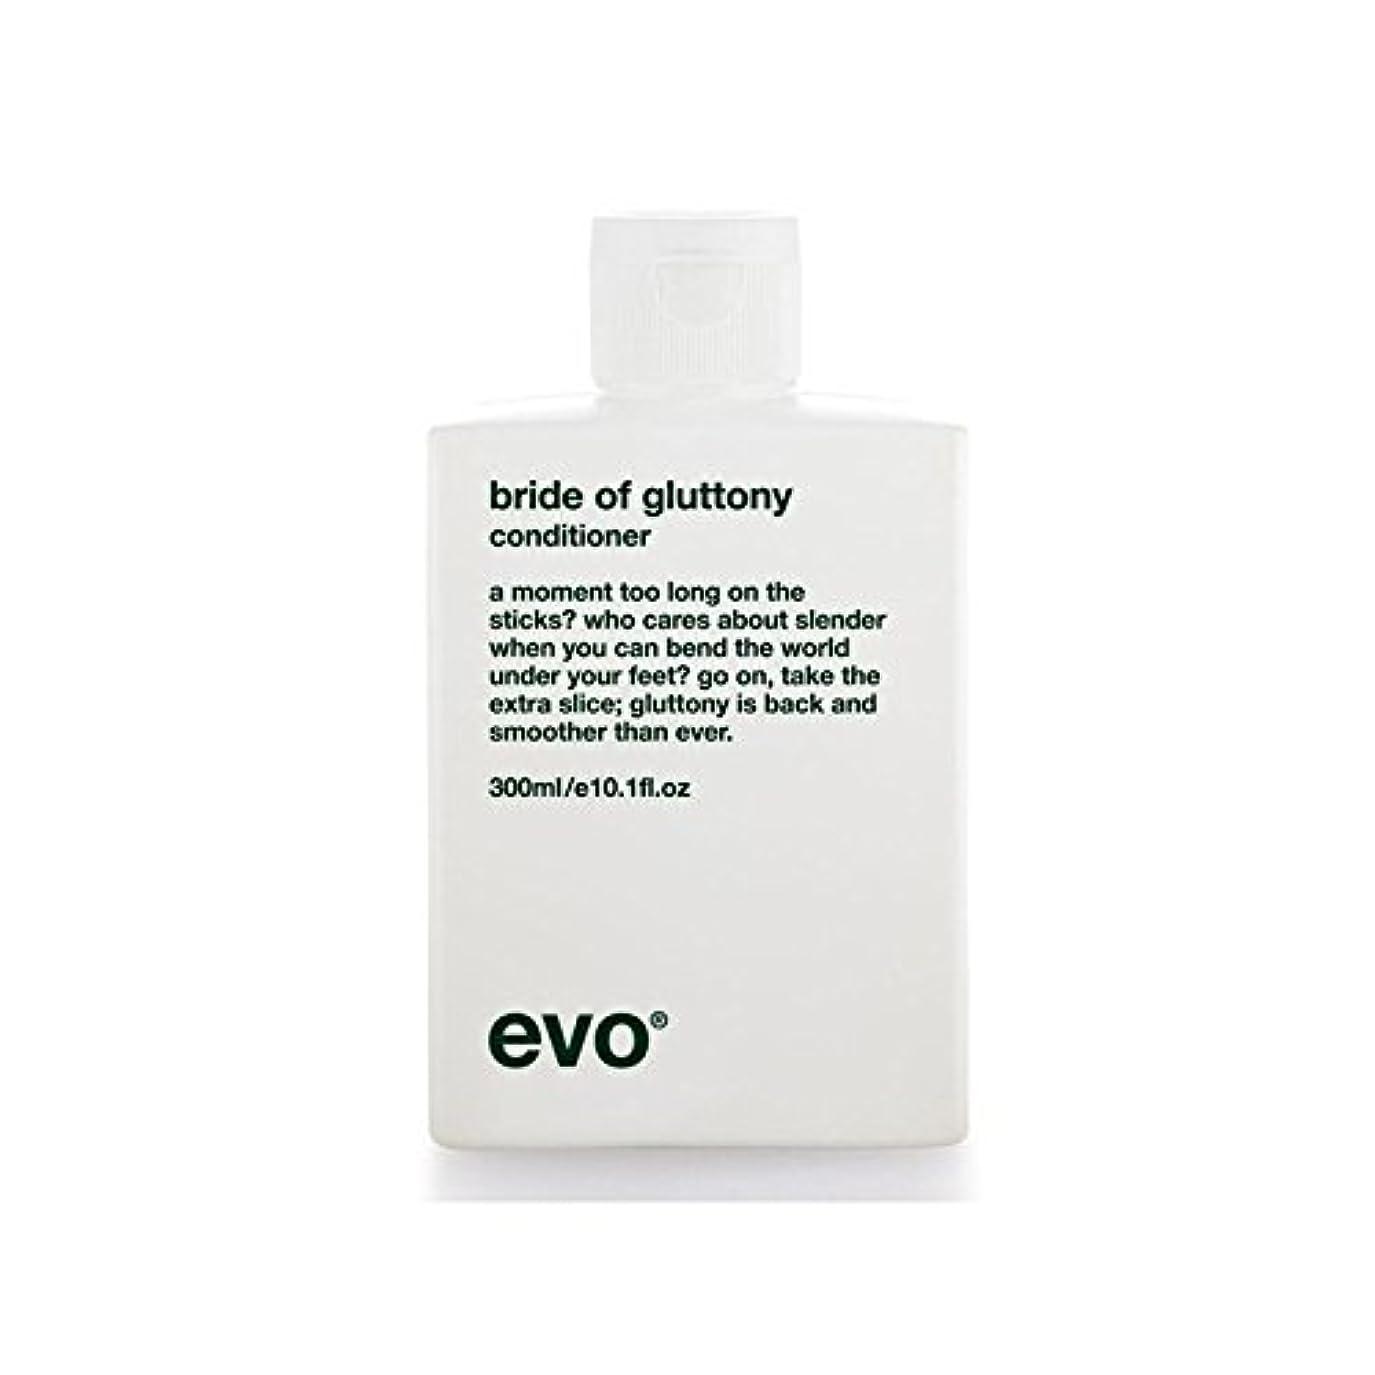 Evo Bride Of Gluttony Volume Conditioner - 飽食のボリュームコンディショナーのエボ花嫁 [並行輸入品]